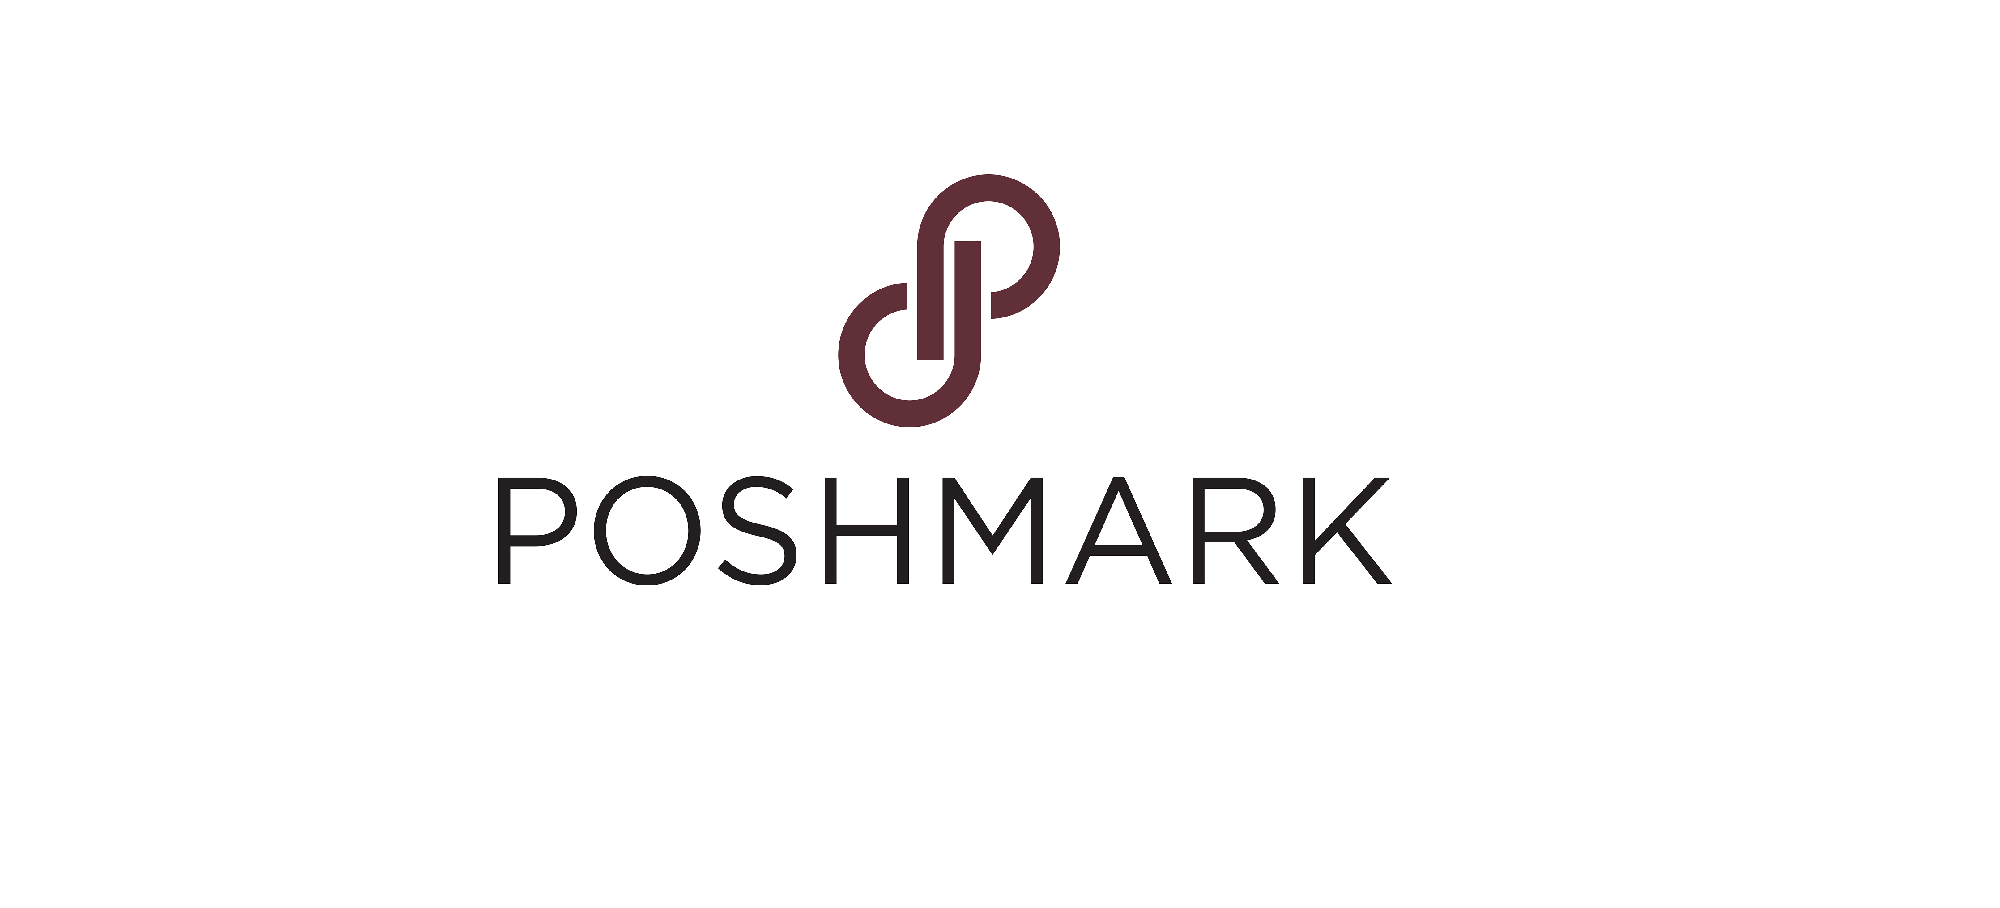 Sites Like Poshmark